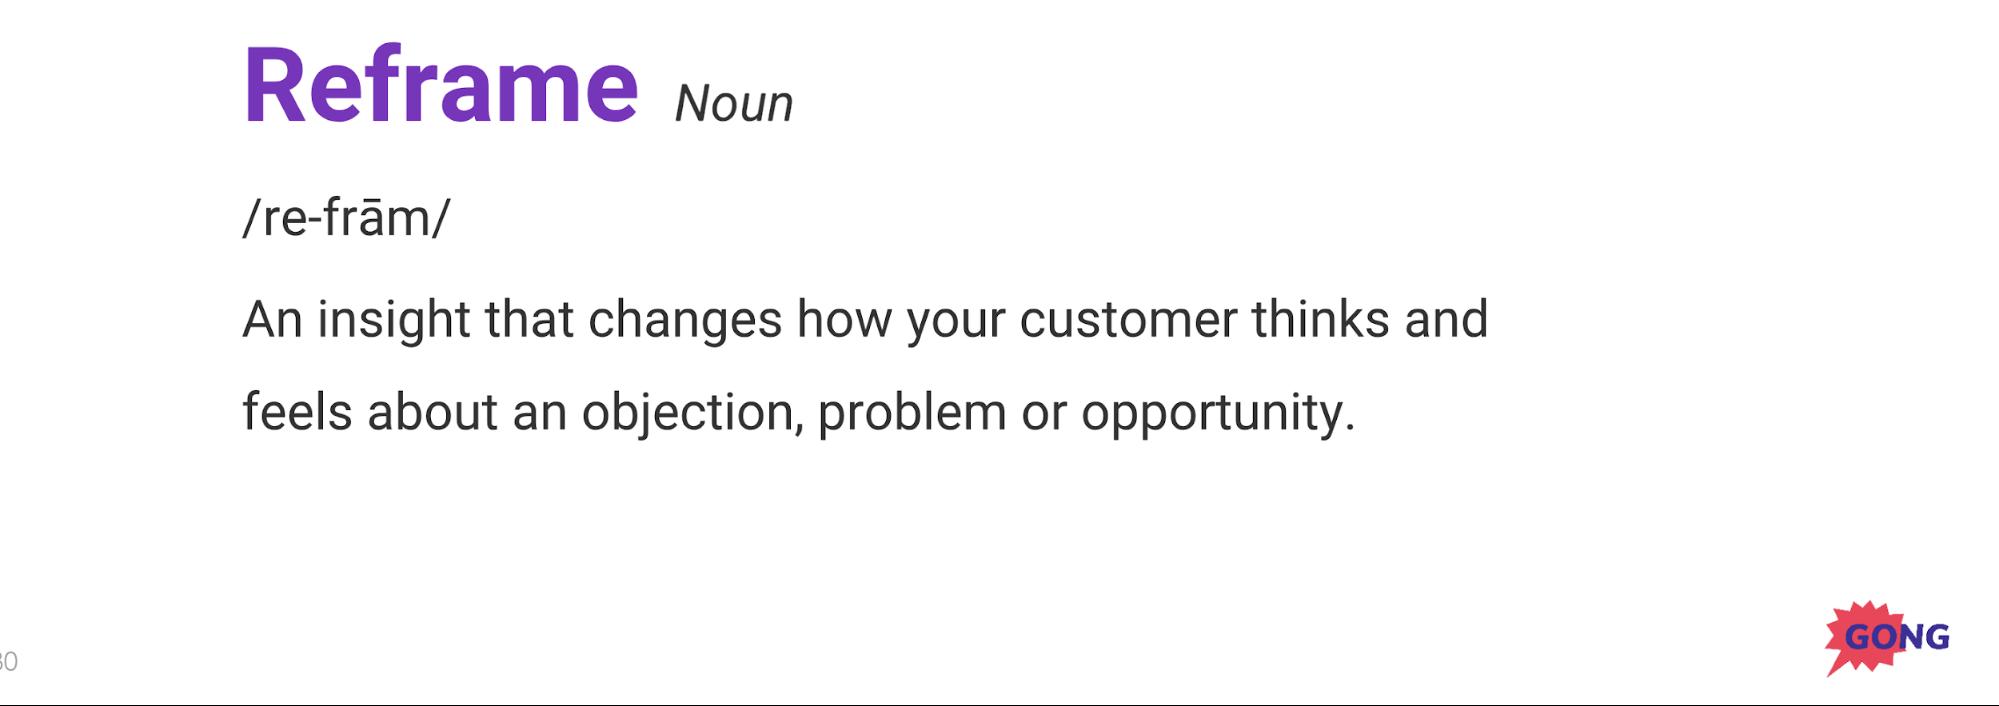 Reframe sales technique